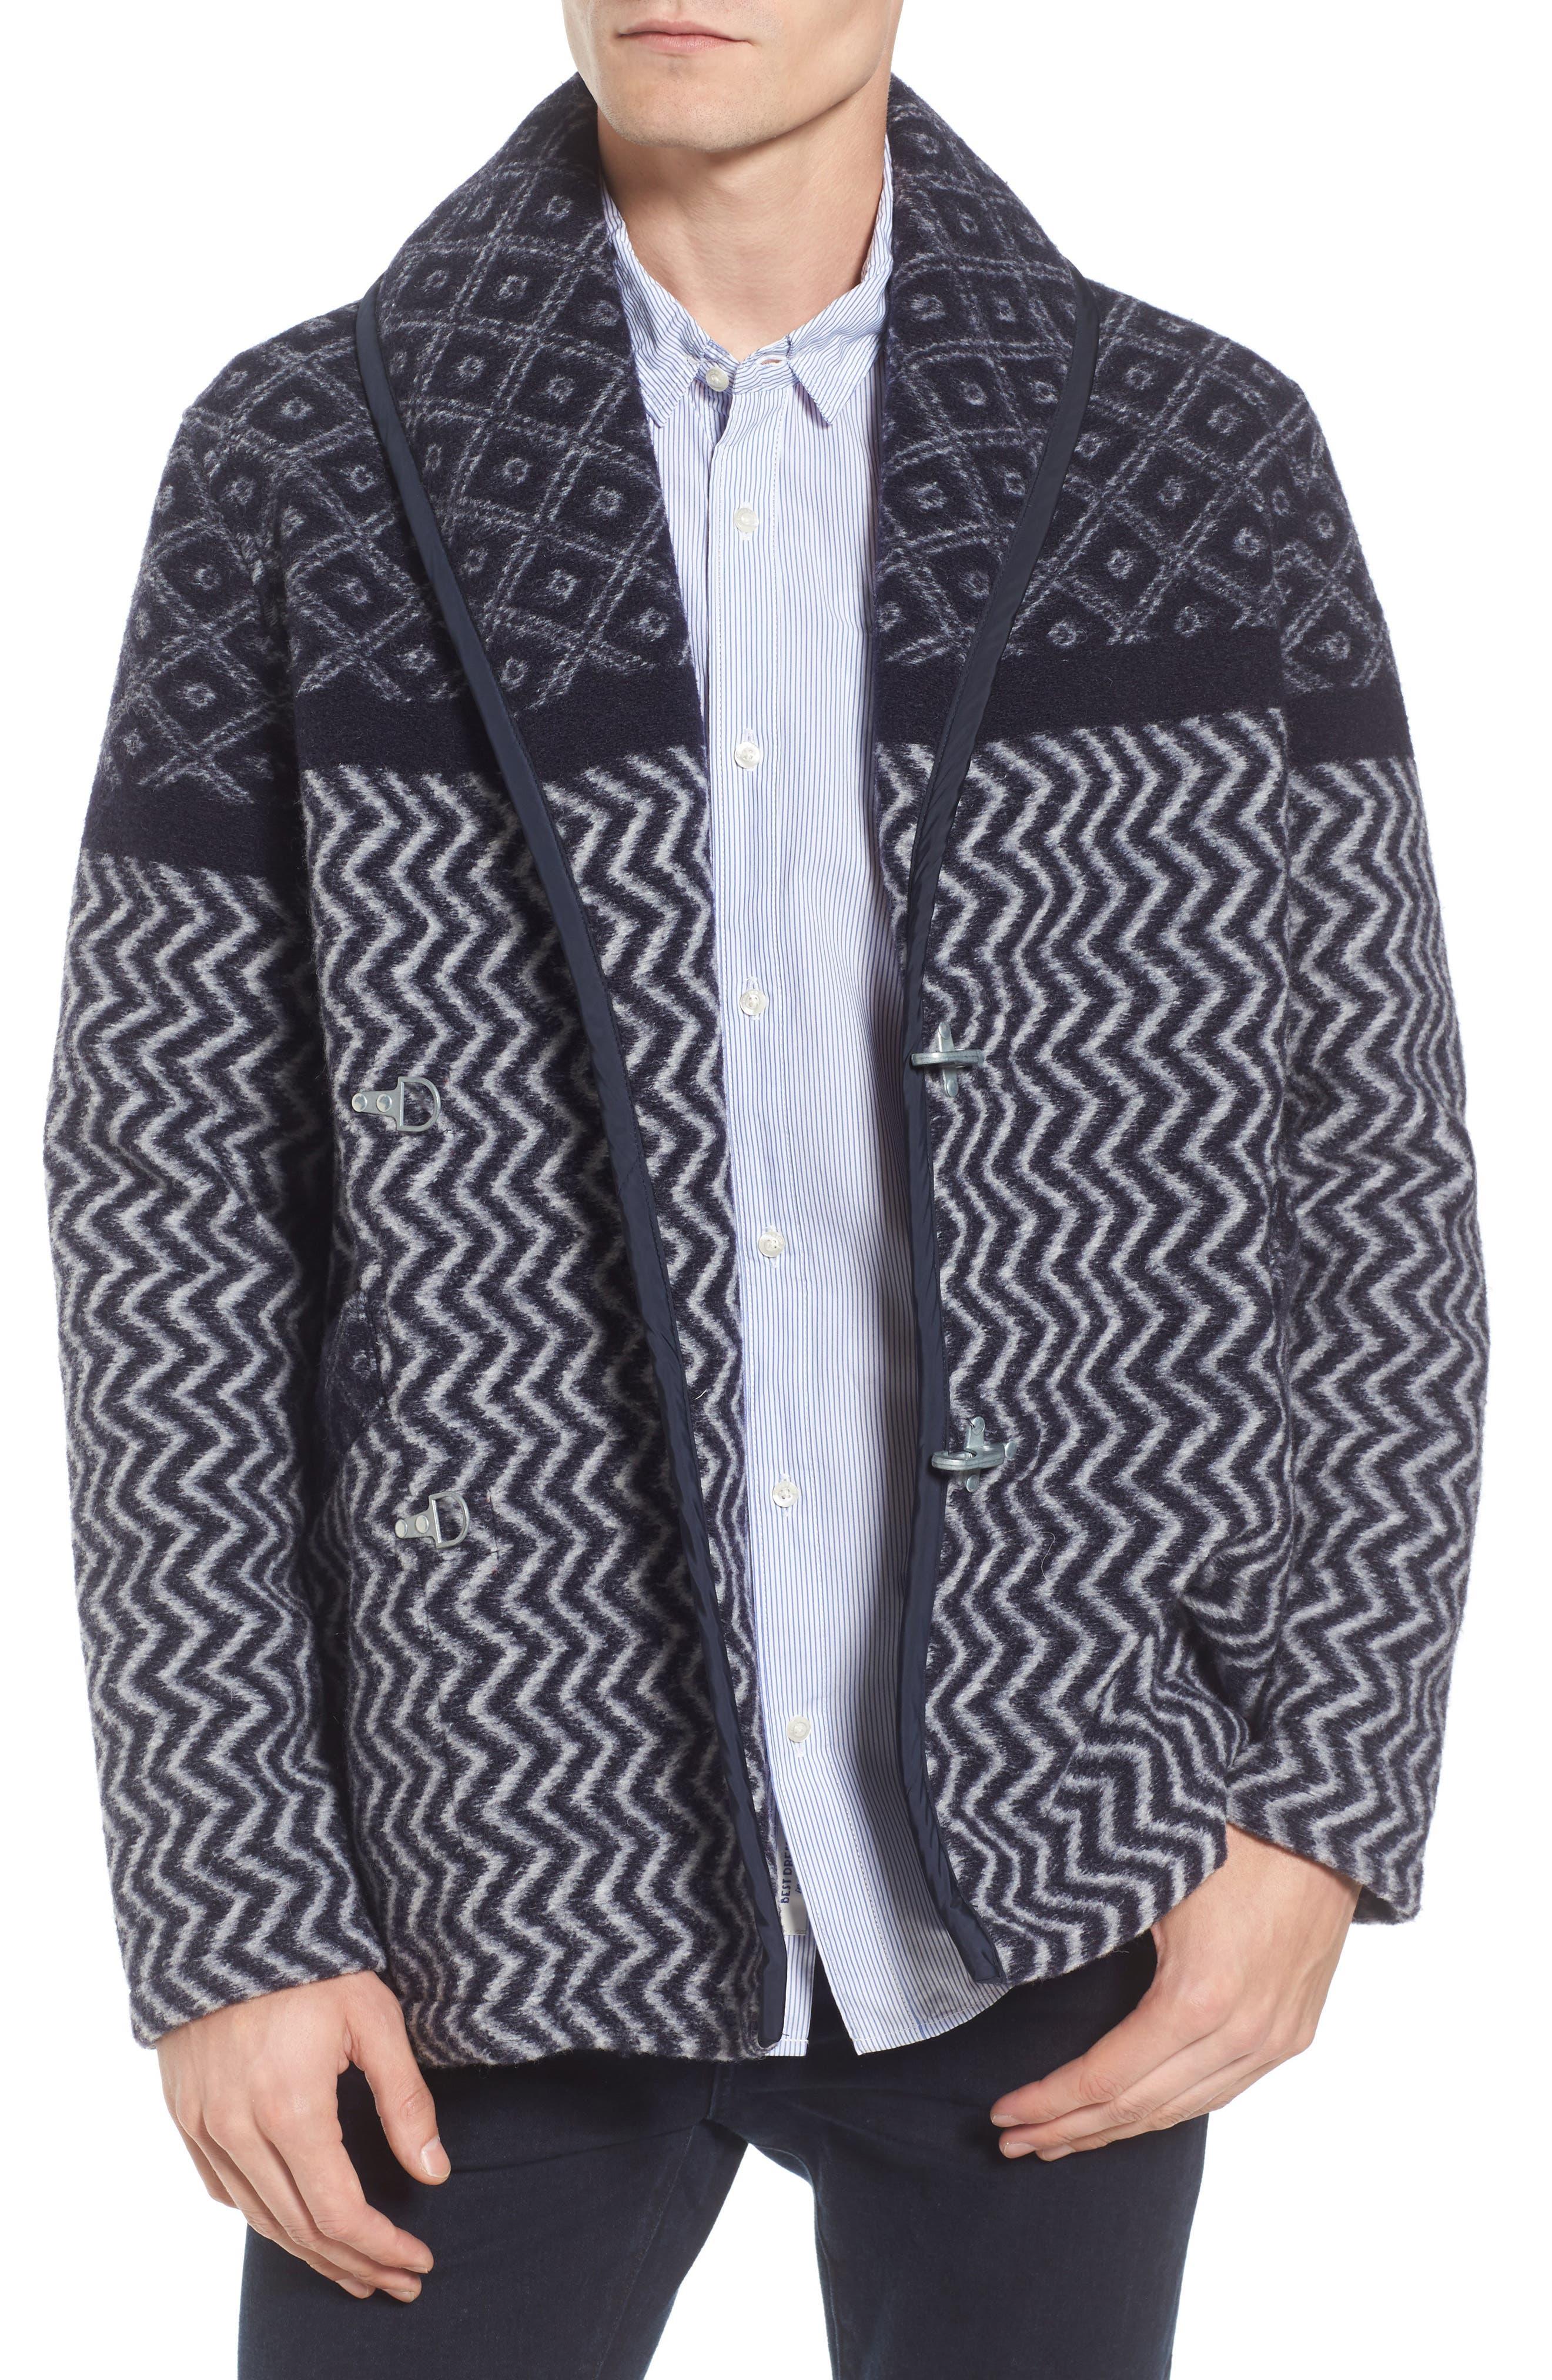 Blanket Jacket,                             Main thumbnail 1, color,                             410